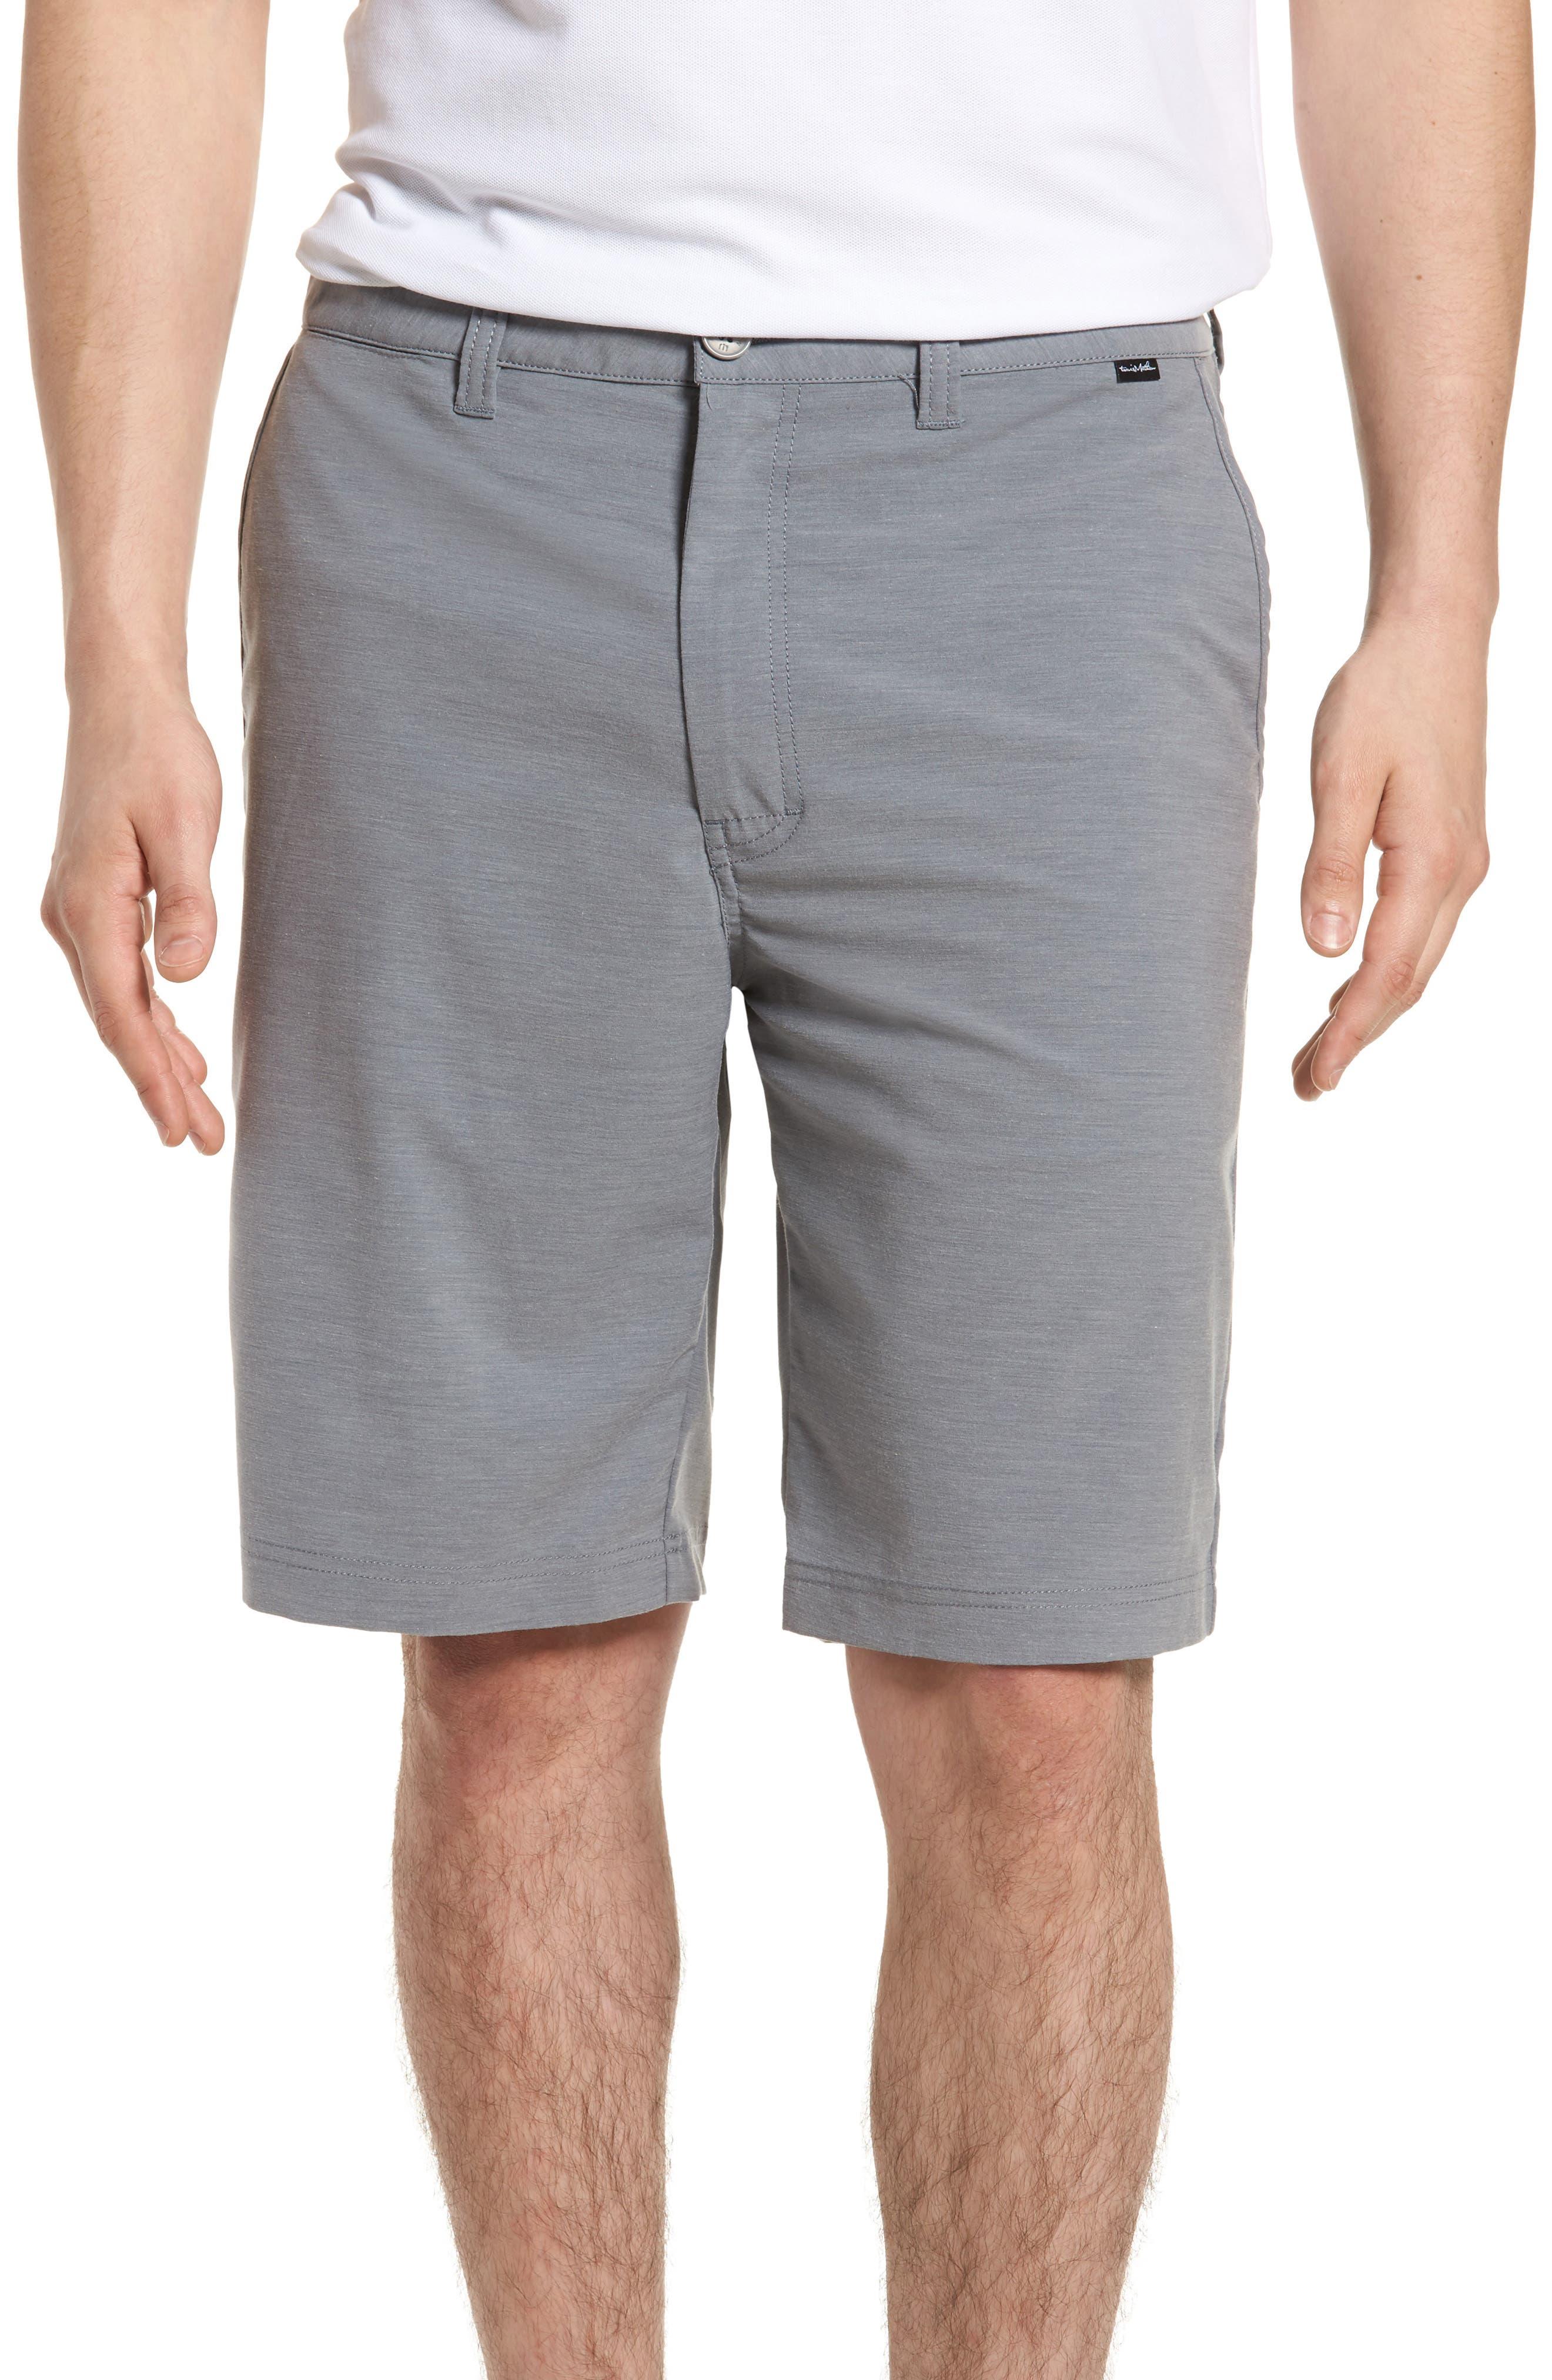 La Paz Regular Fit Slub Knit Shorts,                             Main thumbnail 1, color,                             020